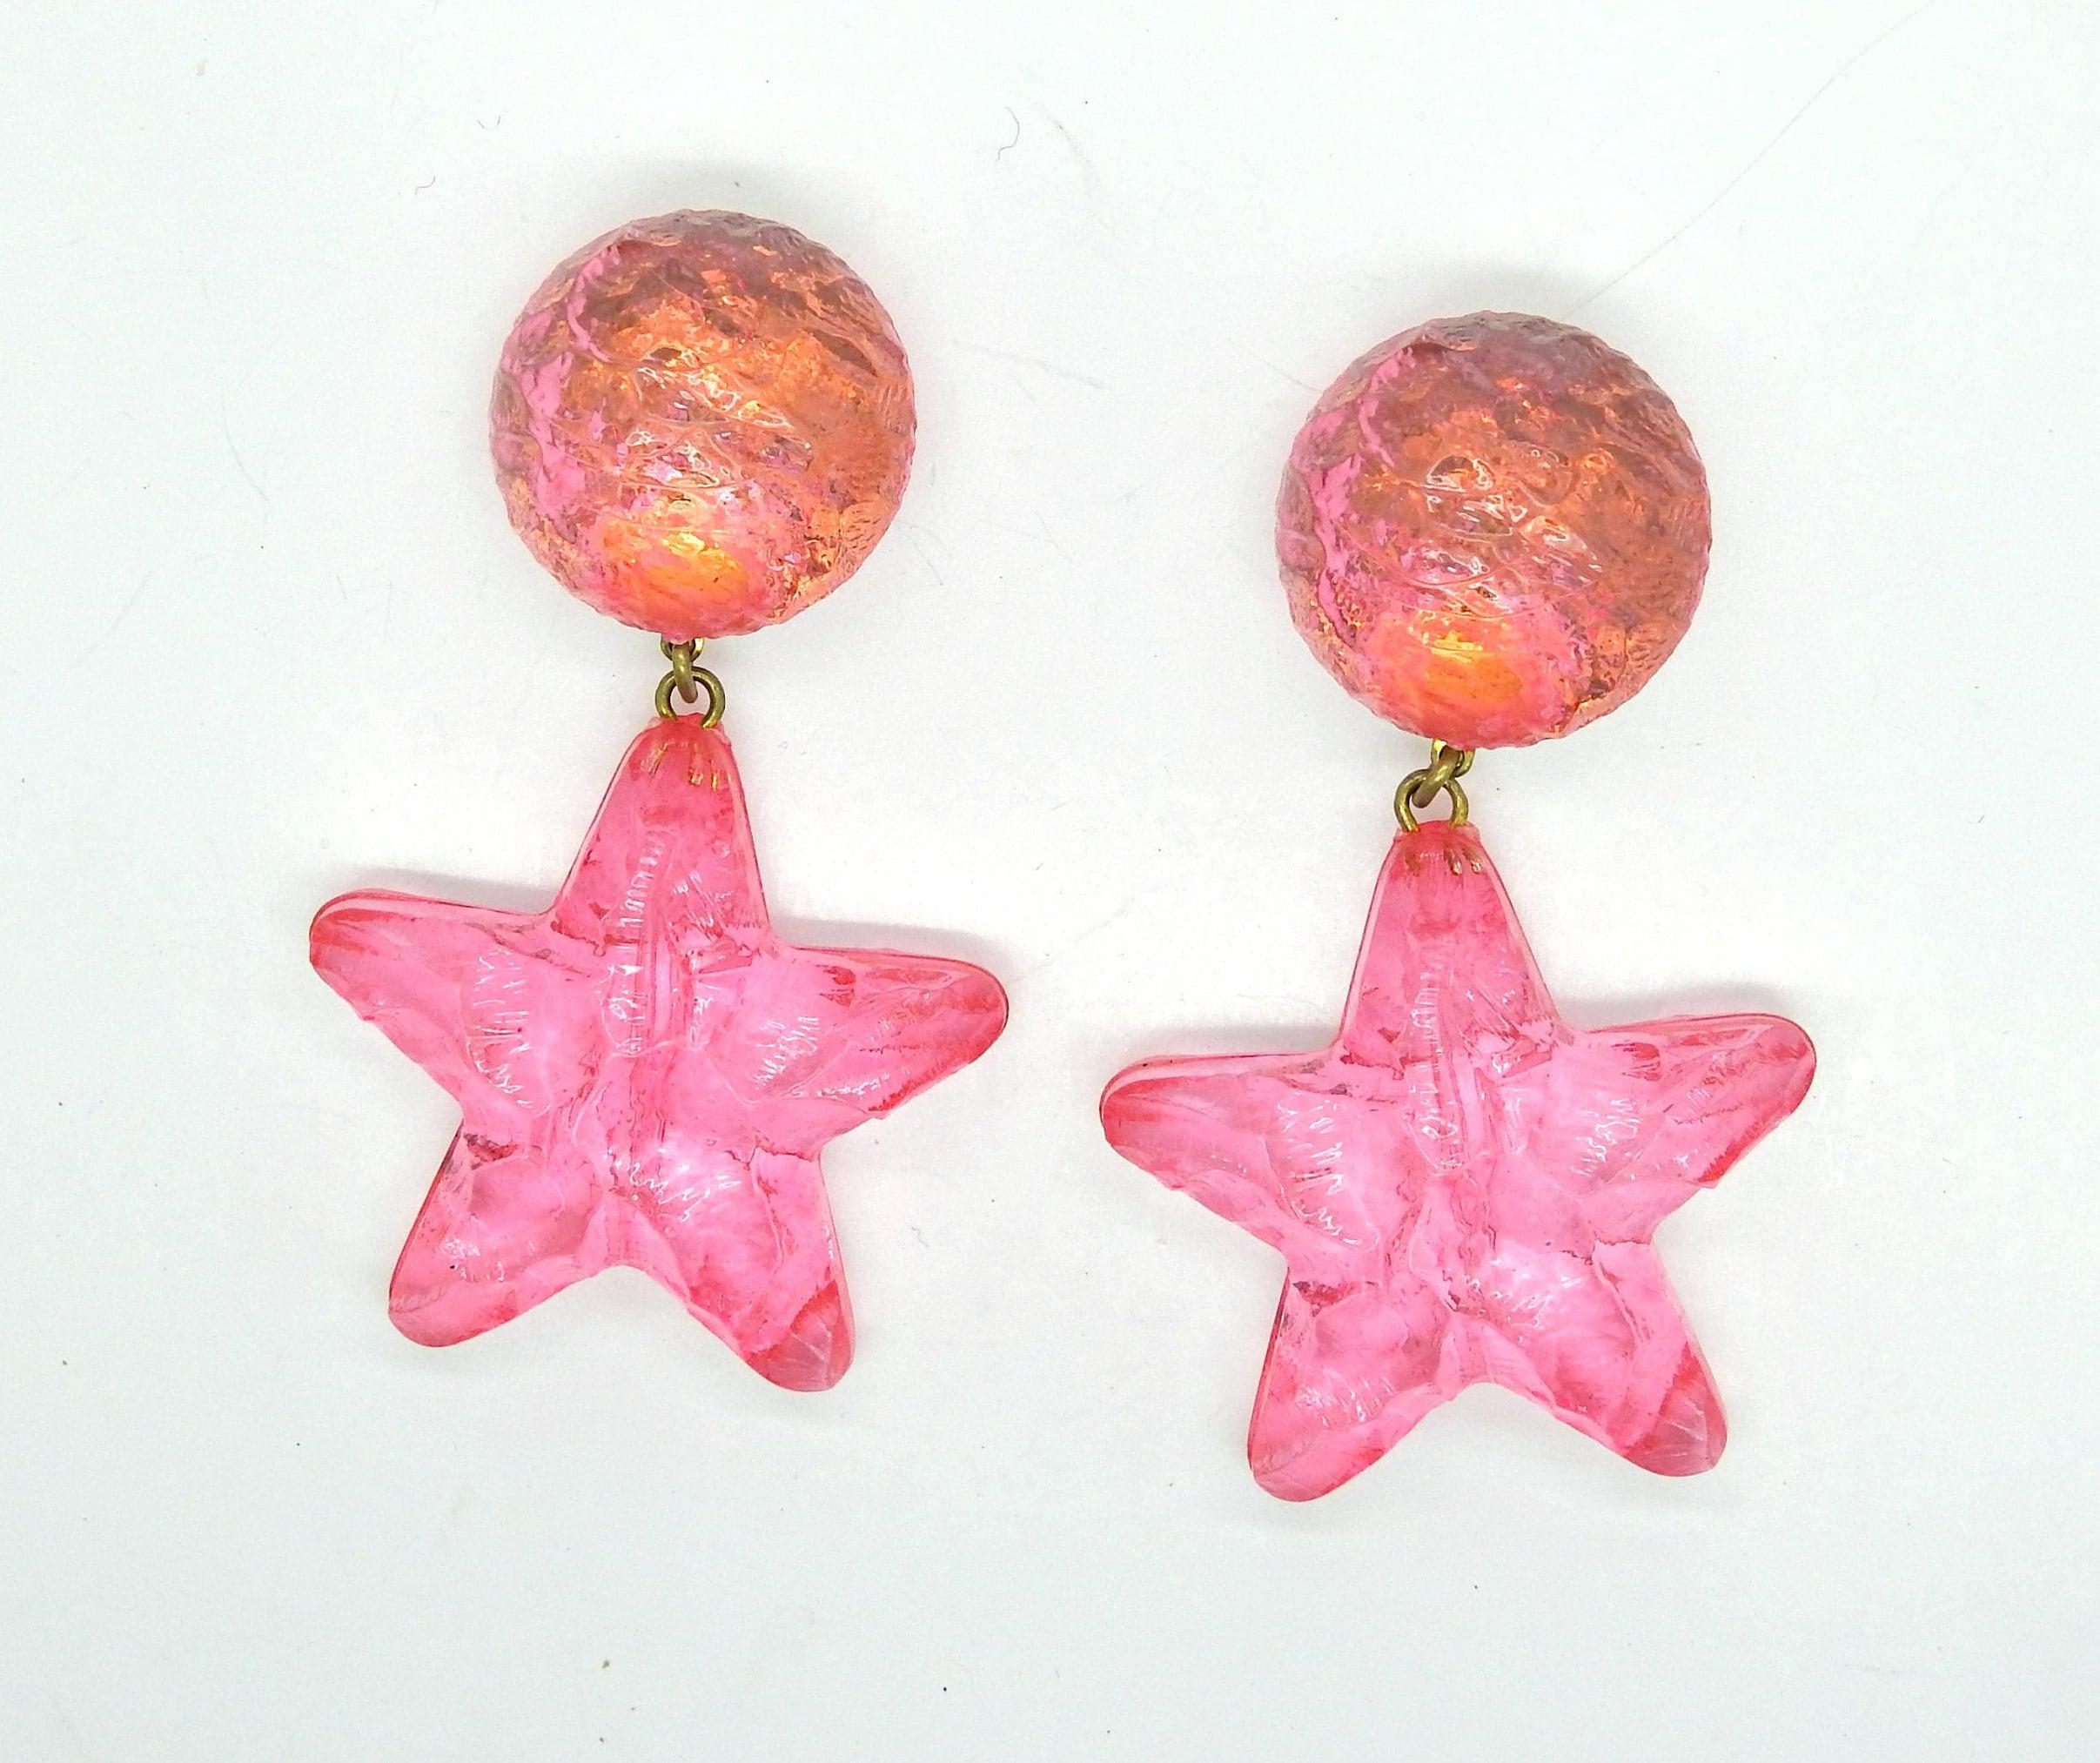 https://www.shopzazaofcanada.com/listing/563960223/boucles-doreilles-clips-pour-oreilles